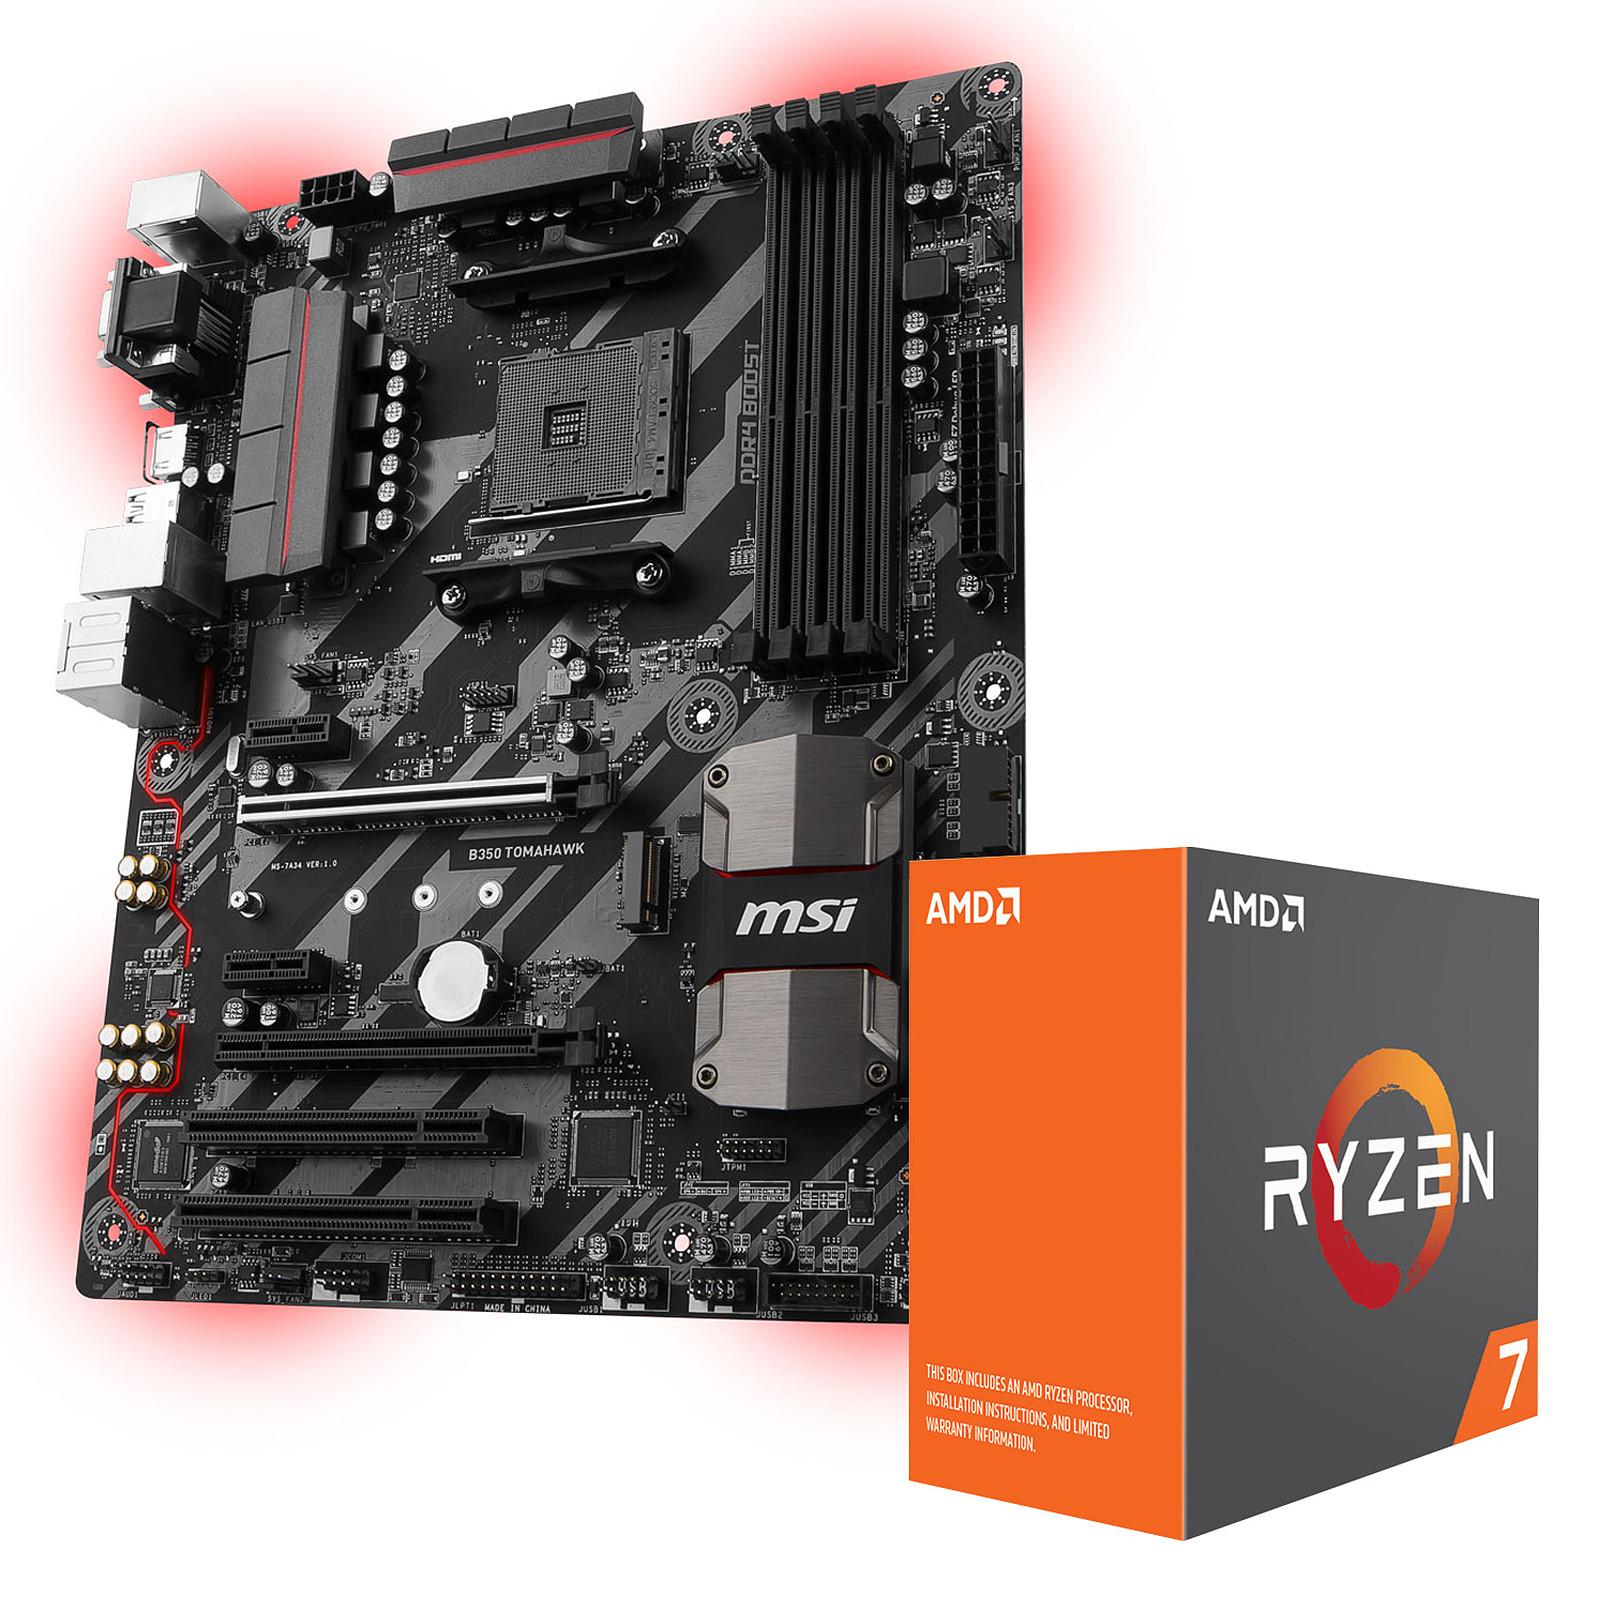 carte mere socket am4 AMD Ryzen 7 1700X (3.4 GHz) + MSI B350 TOMAHAWK   Processeur AMD